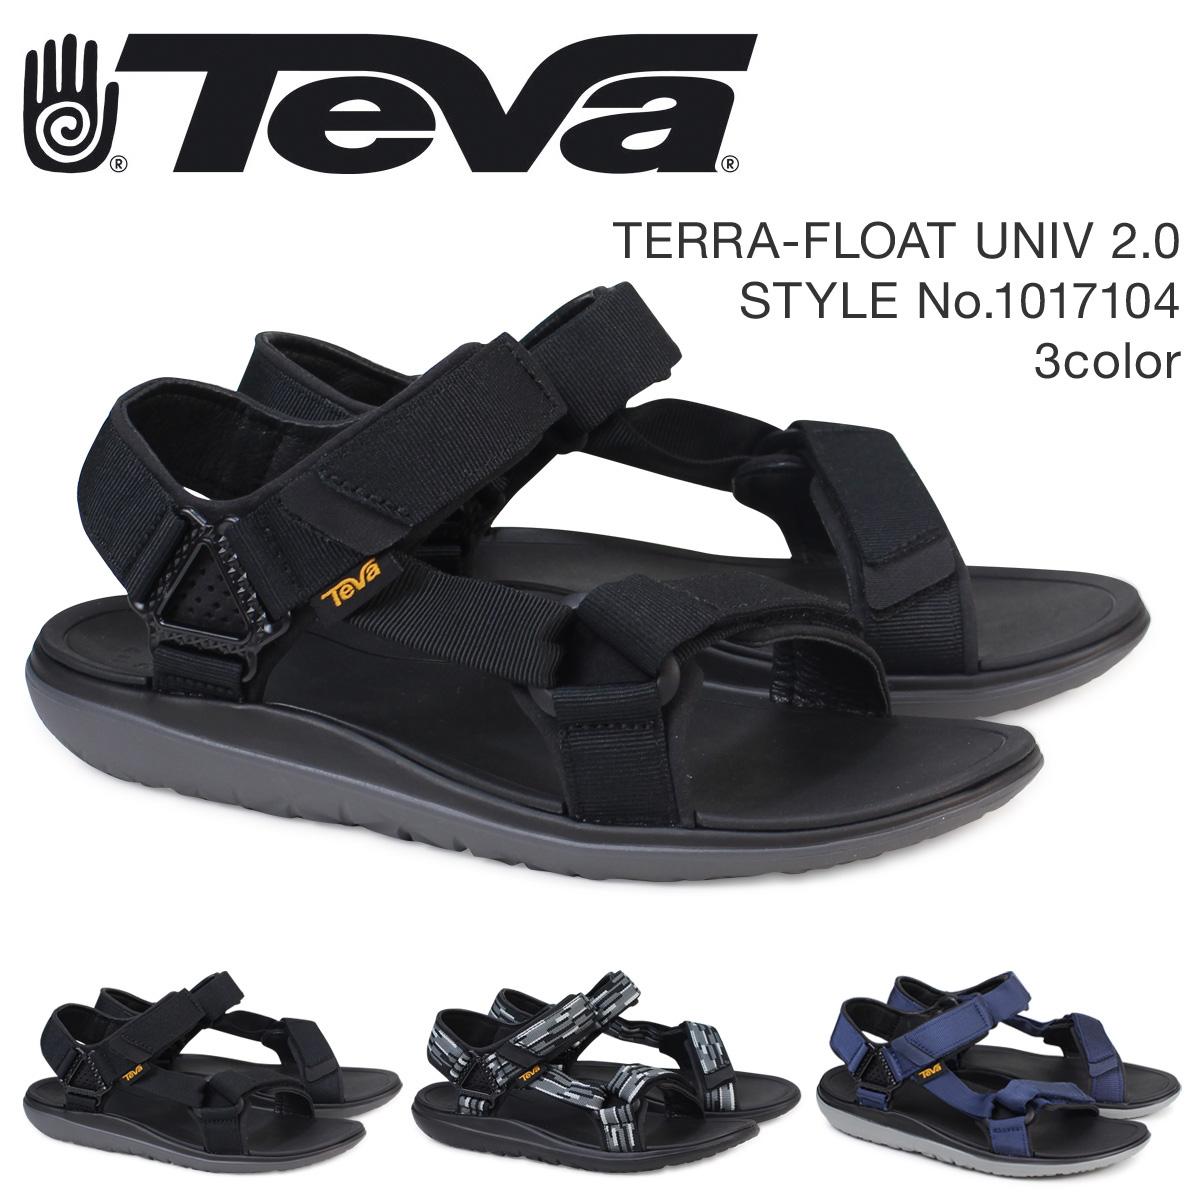 84ff5719a Teva Teva sandals men terra float TERRA-FLOAT UNIV 2.0 MENS 1017104  3 14  Shinnyu load